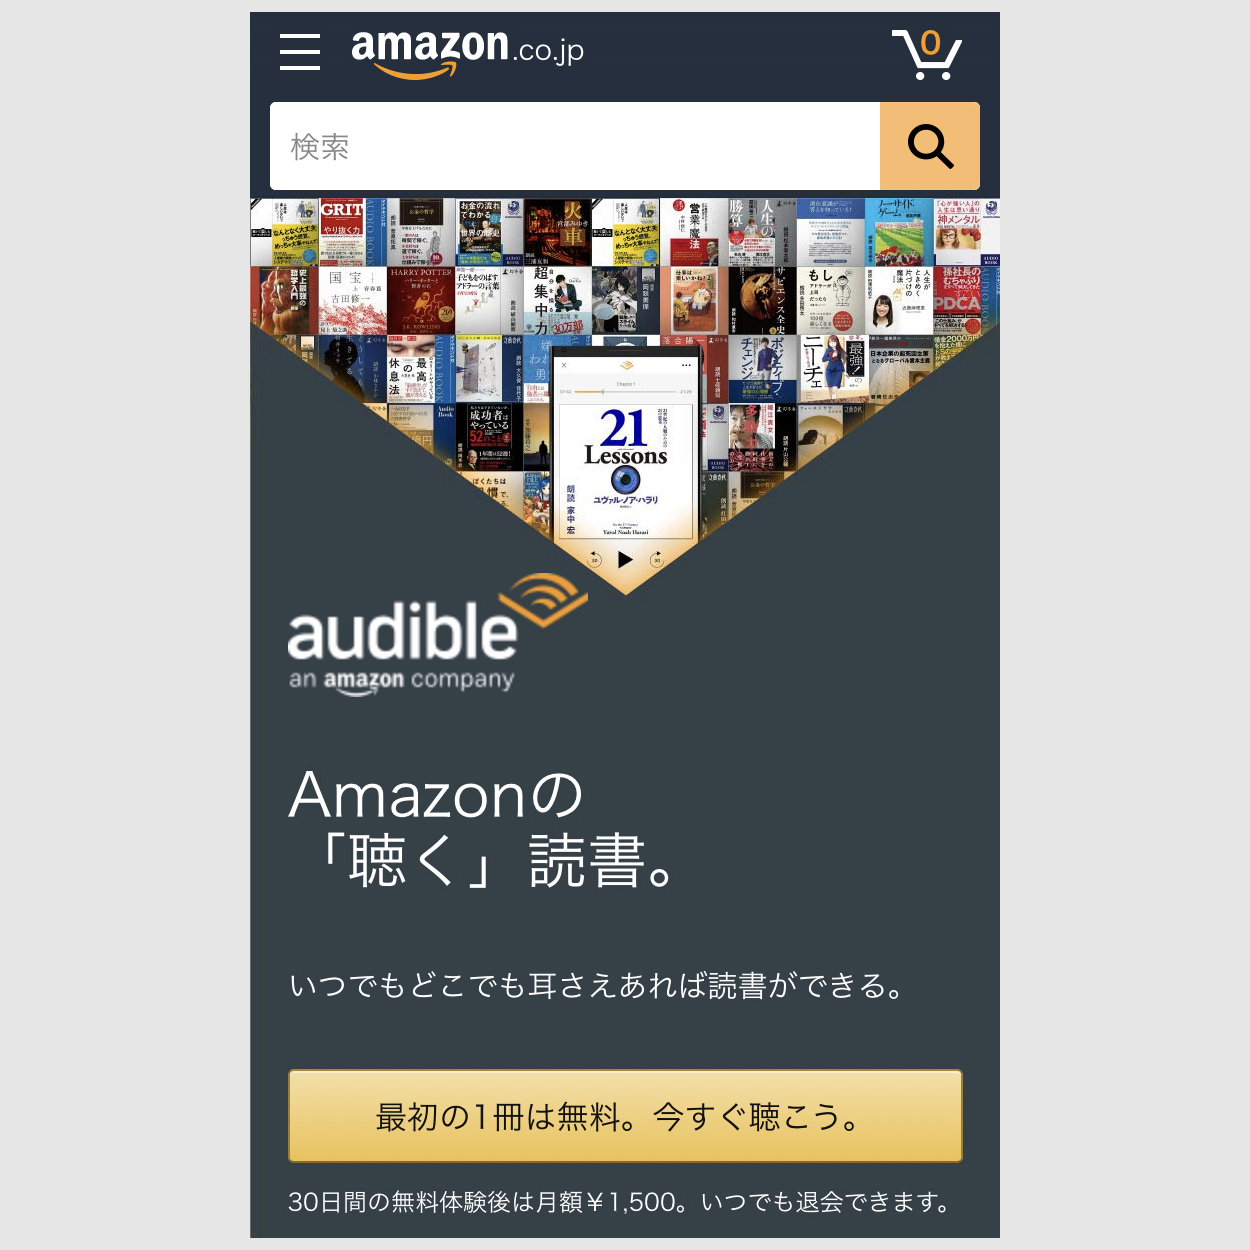 Amazonオーディブル 最初の無料の1冊を申込む方法